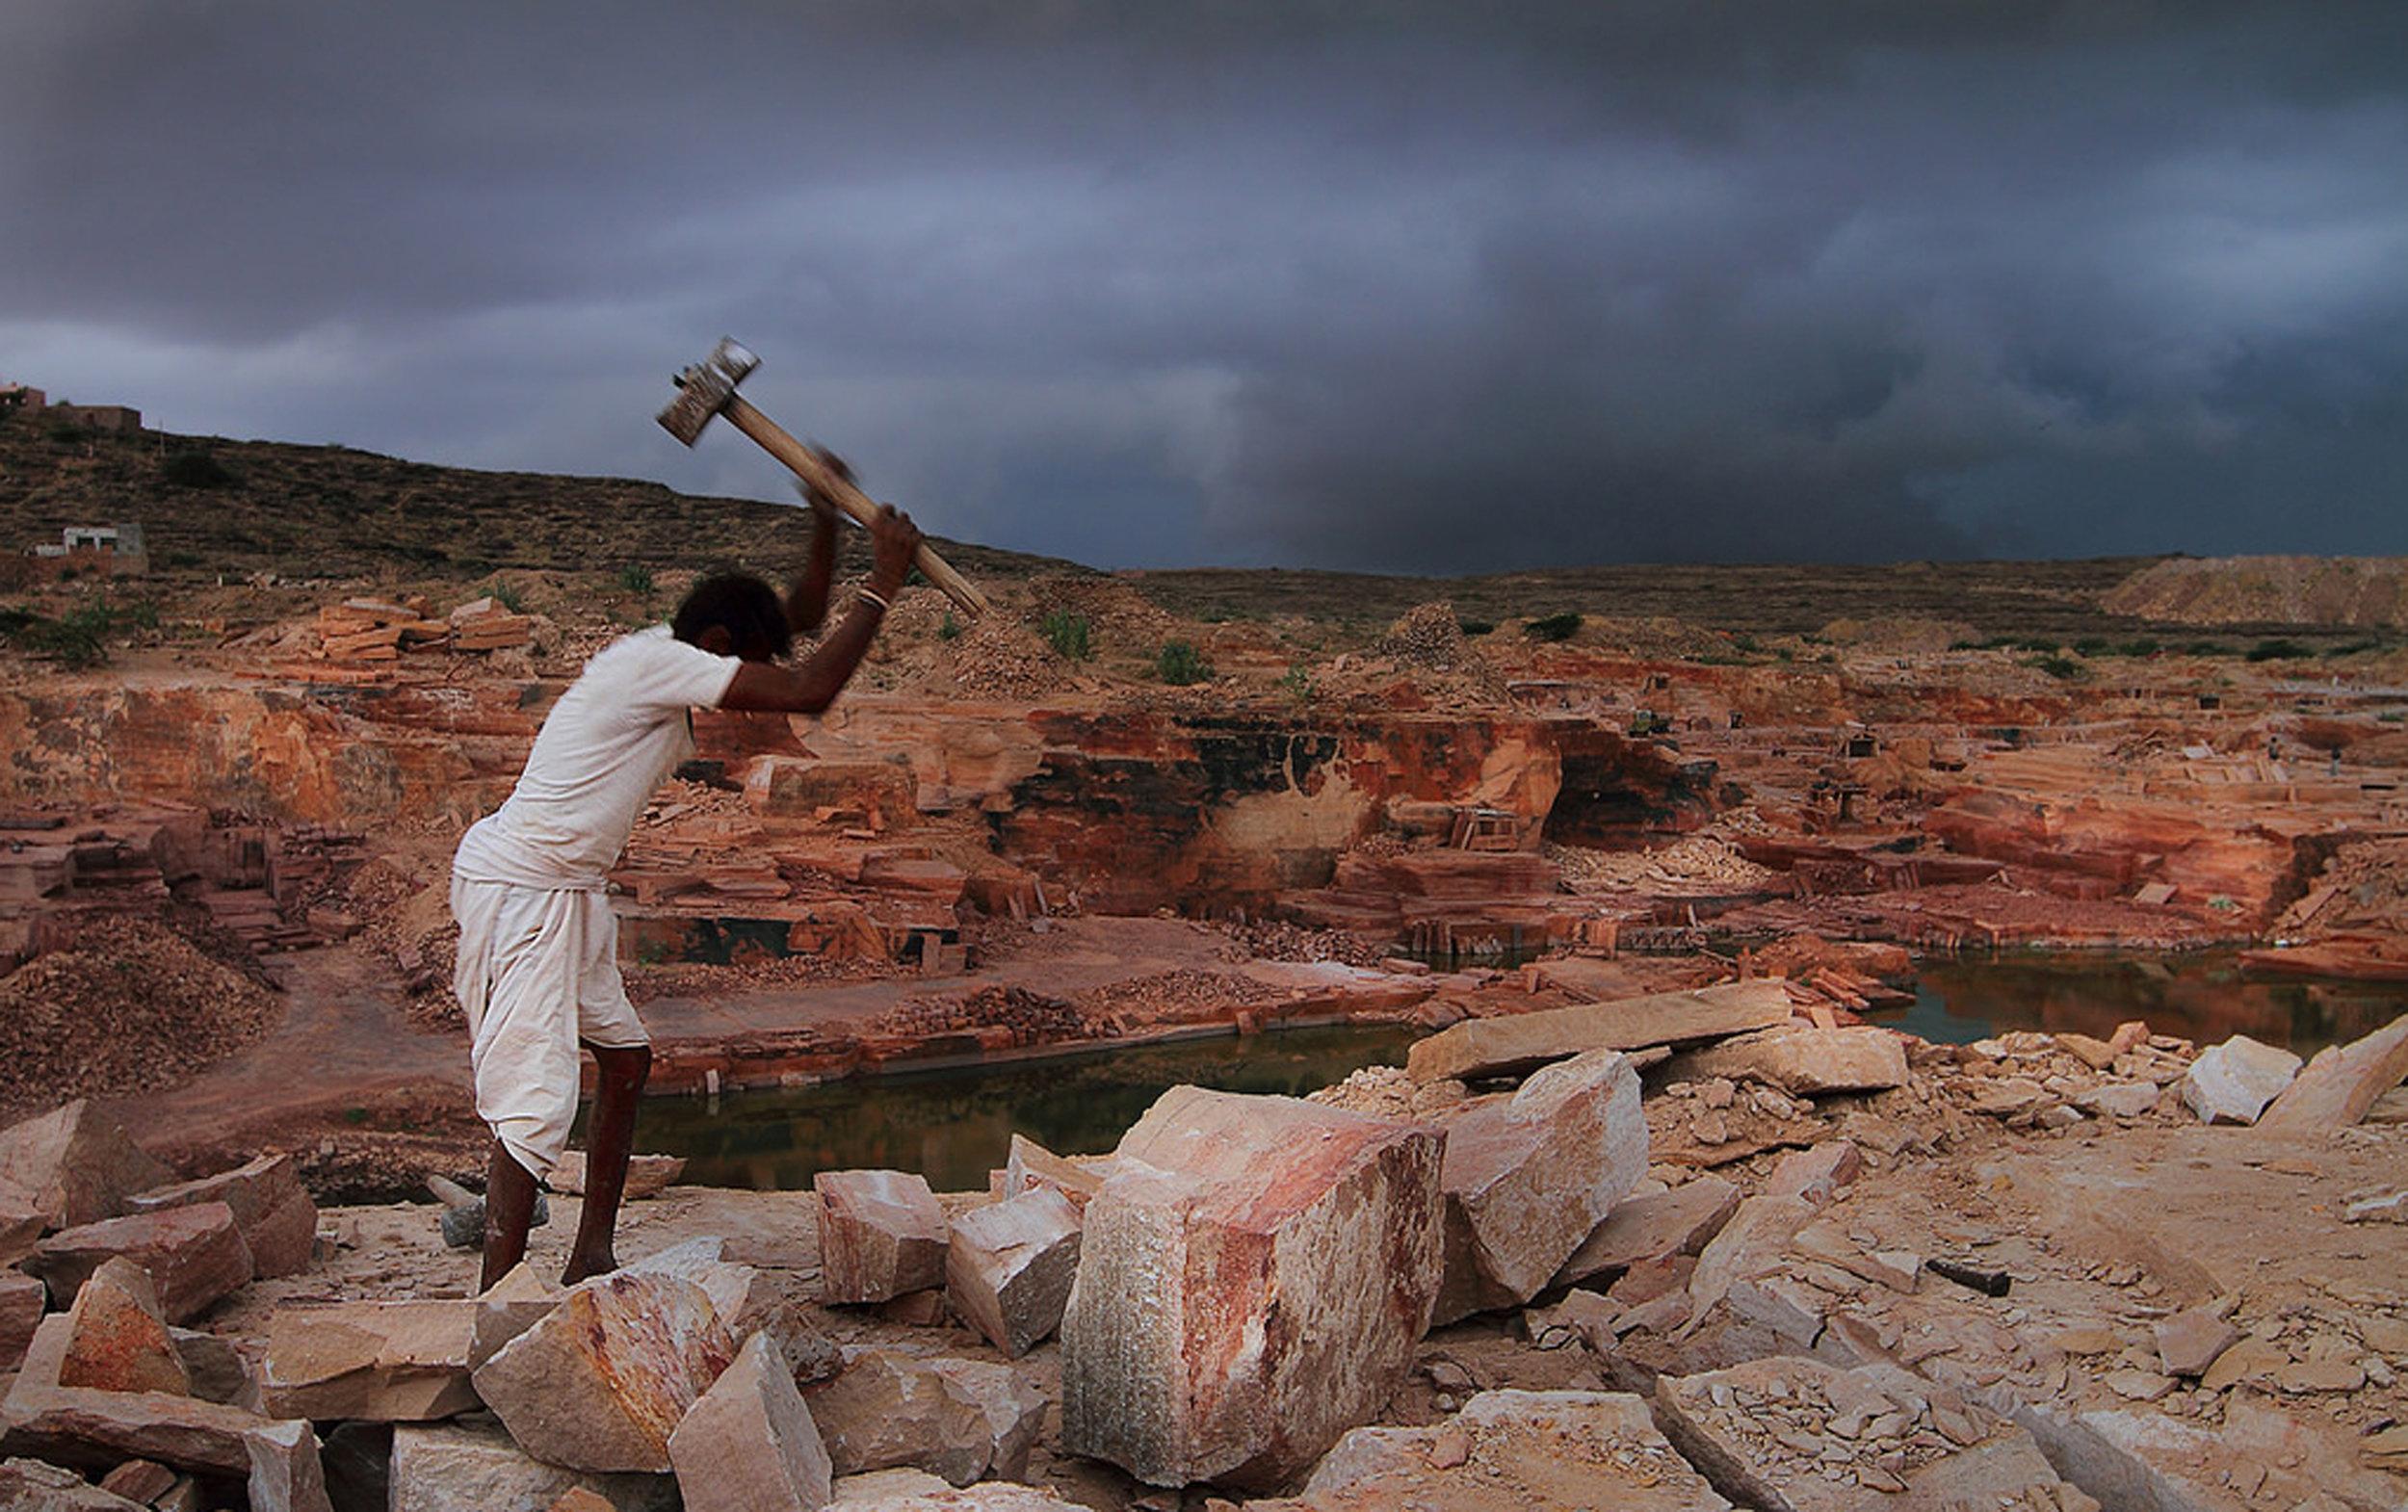 quarry-worker.jpg